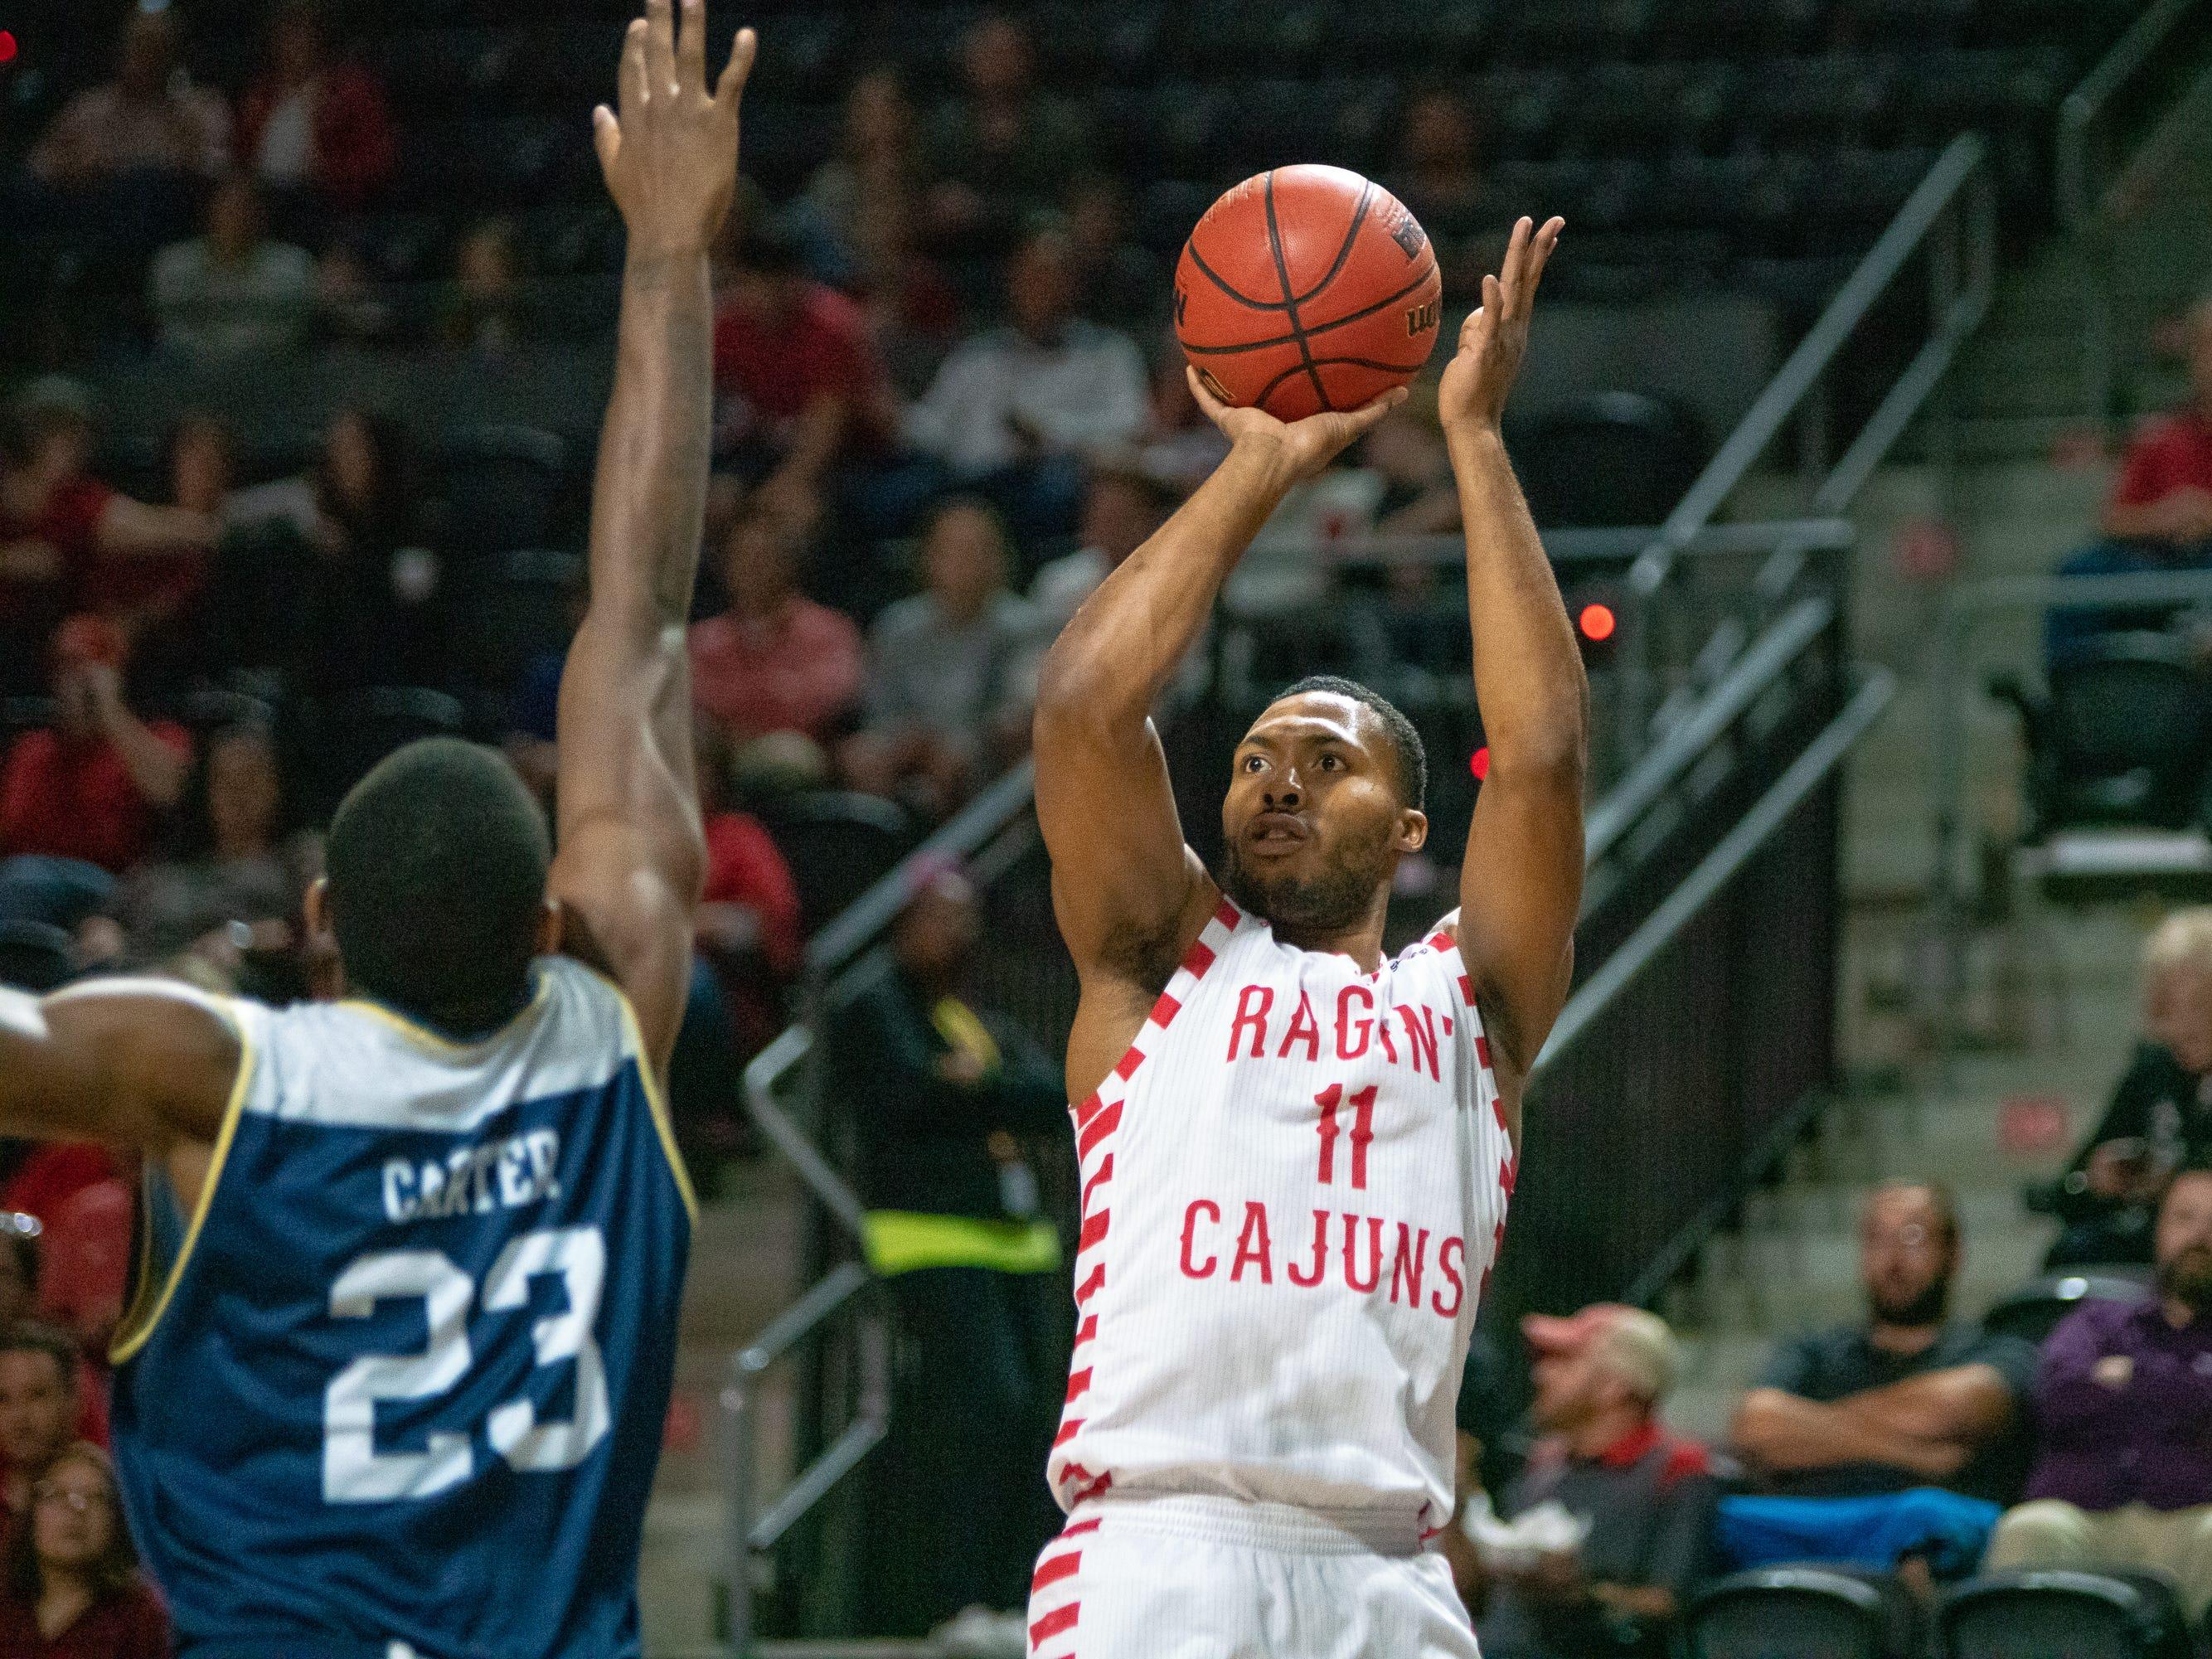 UL's Jerekius Davis shoots the ball to score as the Ragin' Cajuns take on the Georgia Southern Eagles at the Cajundome on Feb. 6, 2019.